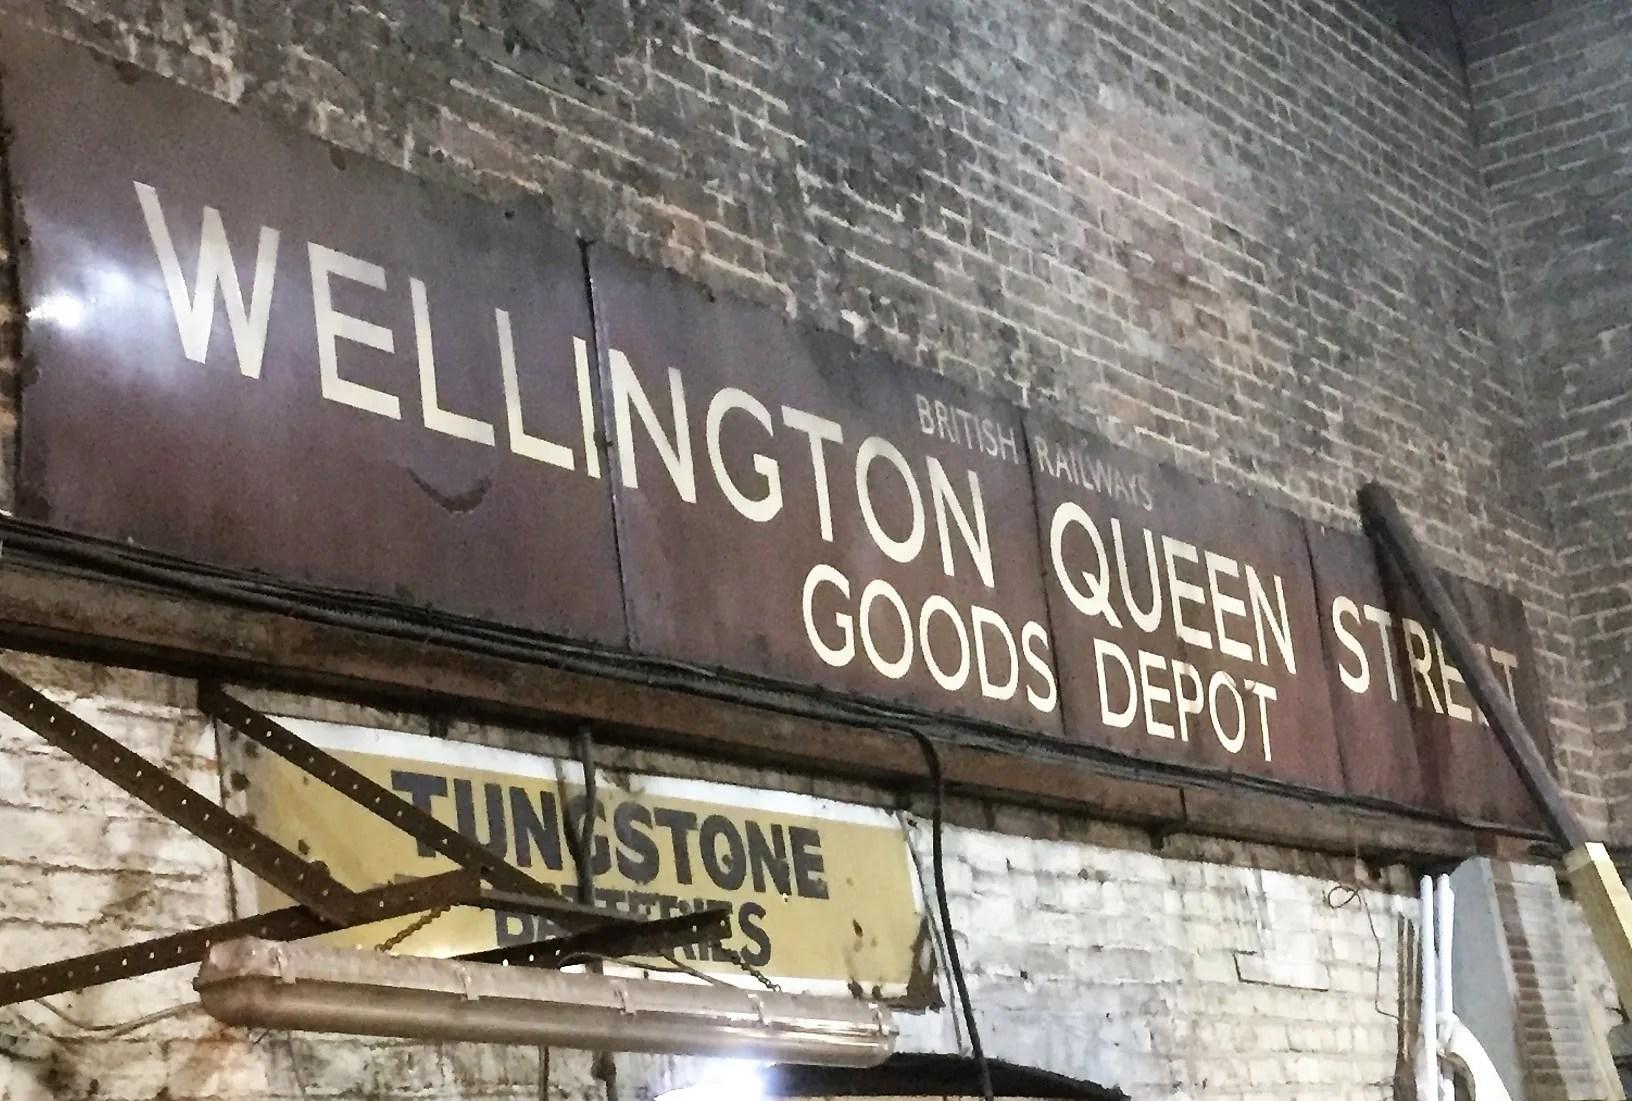 Wellington Queen Street Goods at Telford Steam Railway